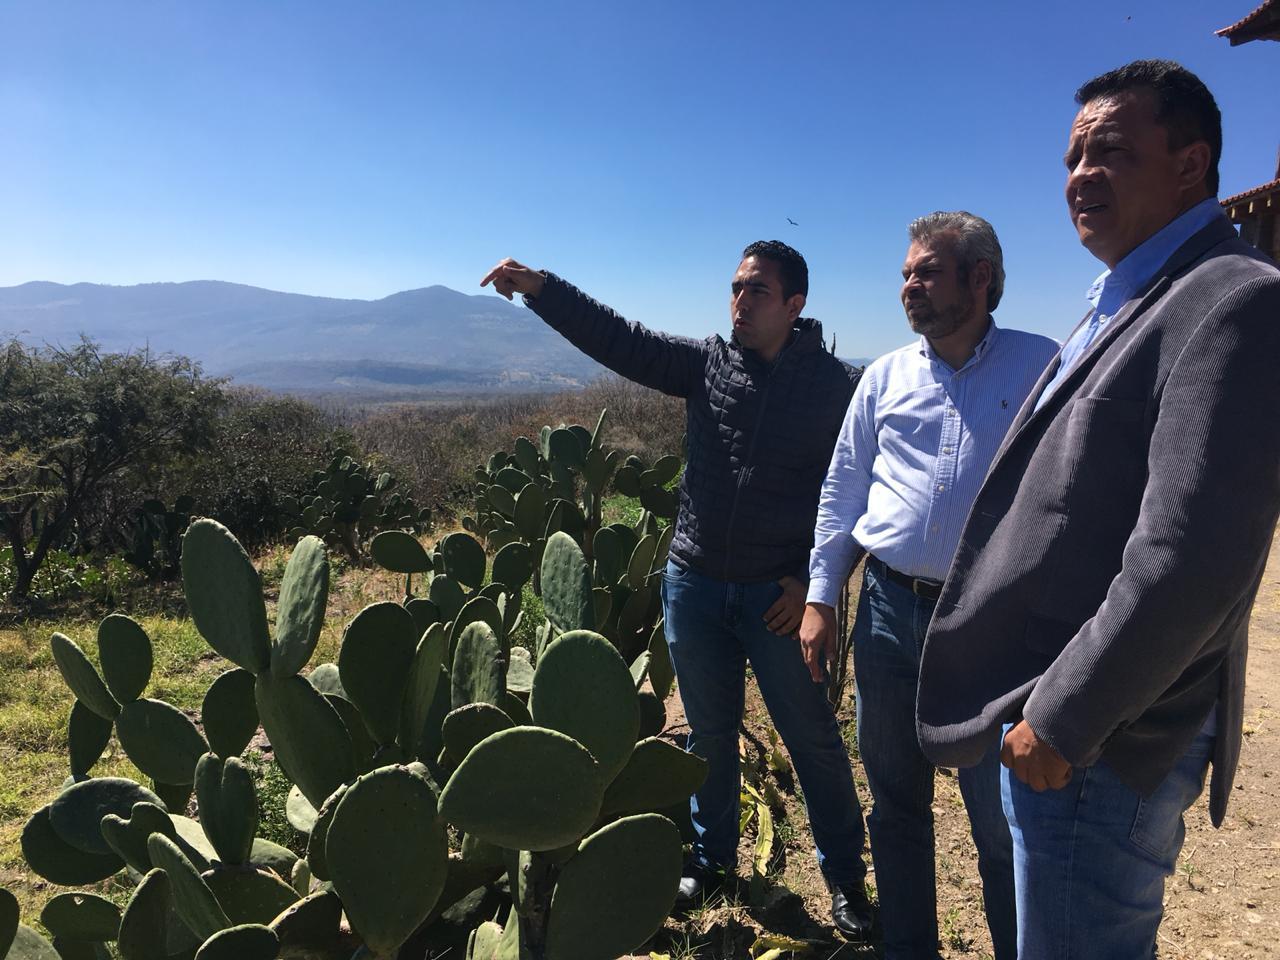 Alfredo Ramírez: Congreso debe dar certeza territorial a Jiquilpan y Sahuayo